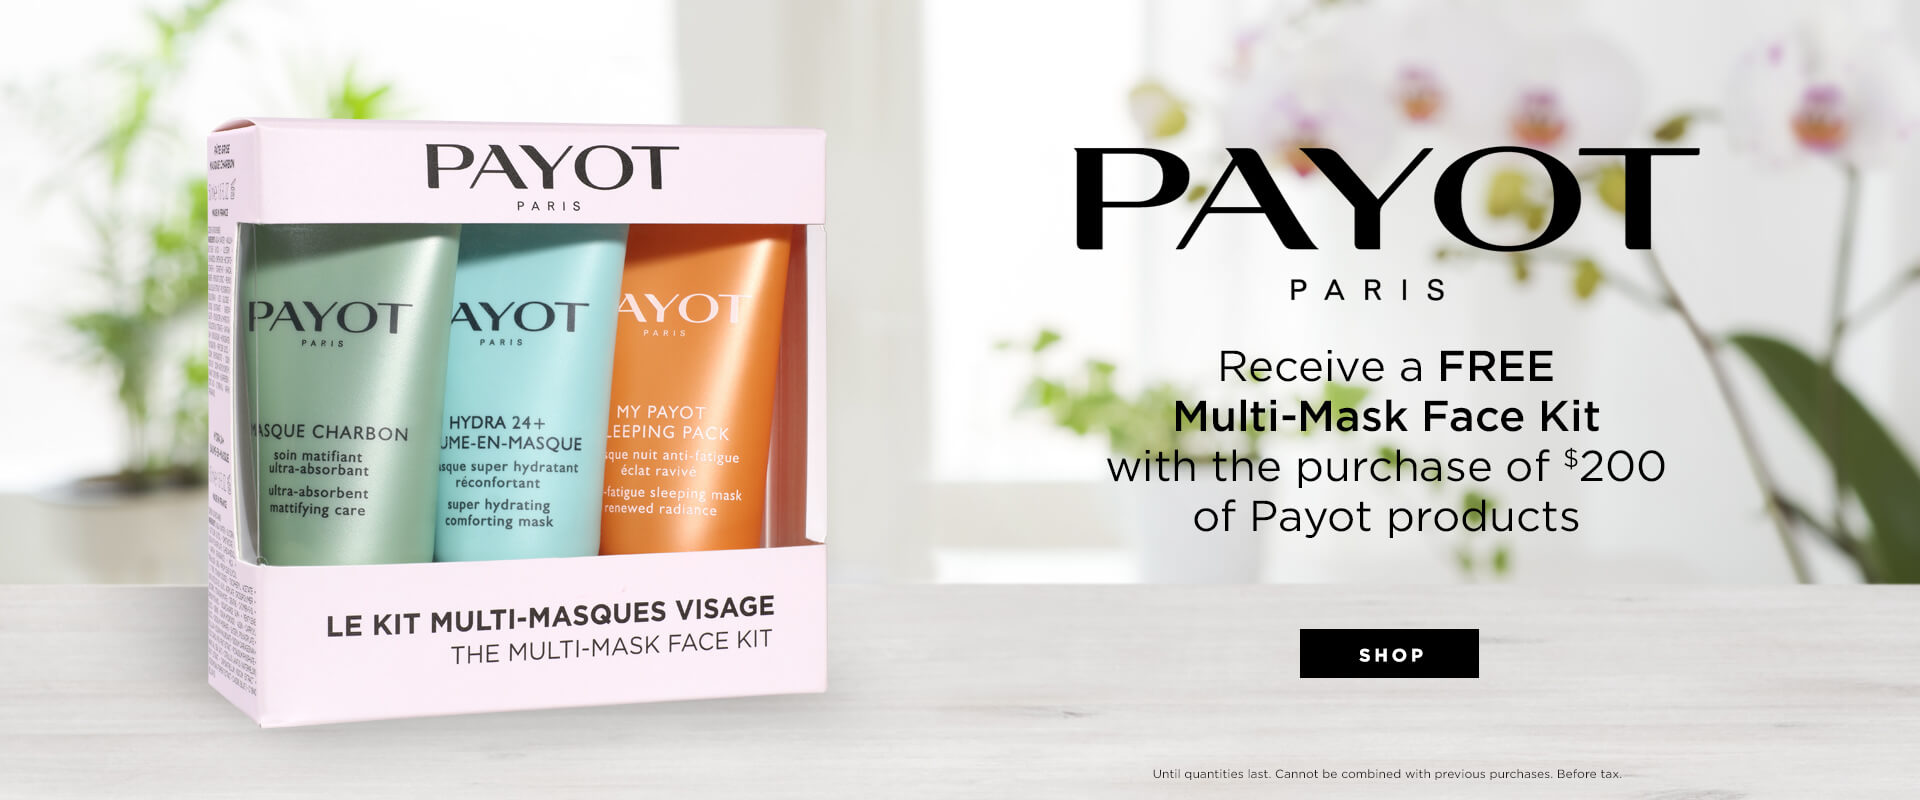 Payot Paris Skin Care